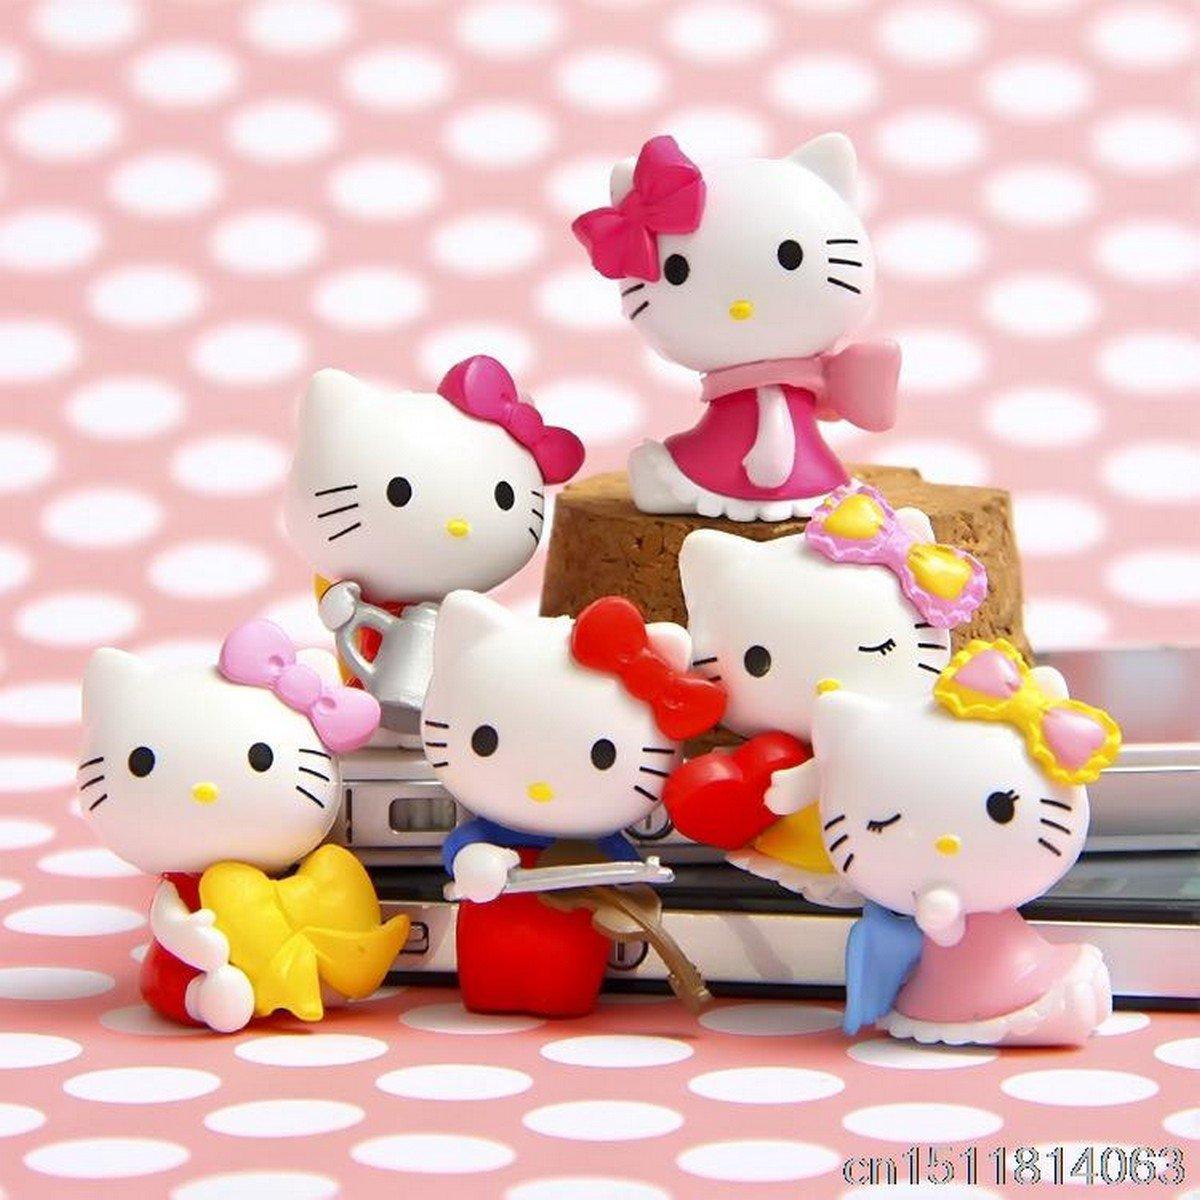 Buy 6Pcslot Anime Cartoon Blink HELLO KITTY Figures Kitty PVC Cut Action Figure Toys Model Dolls Gr